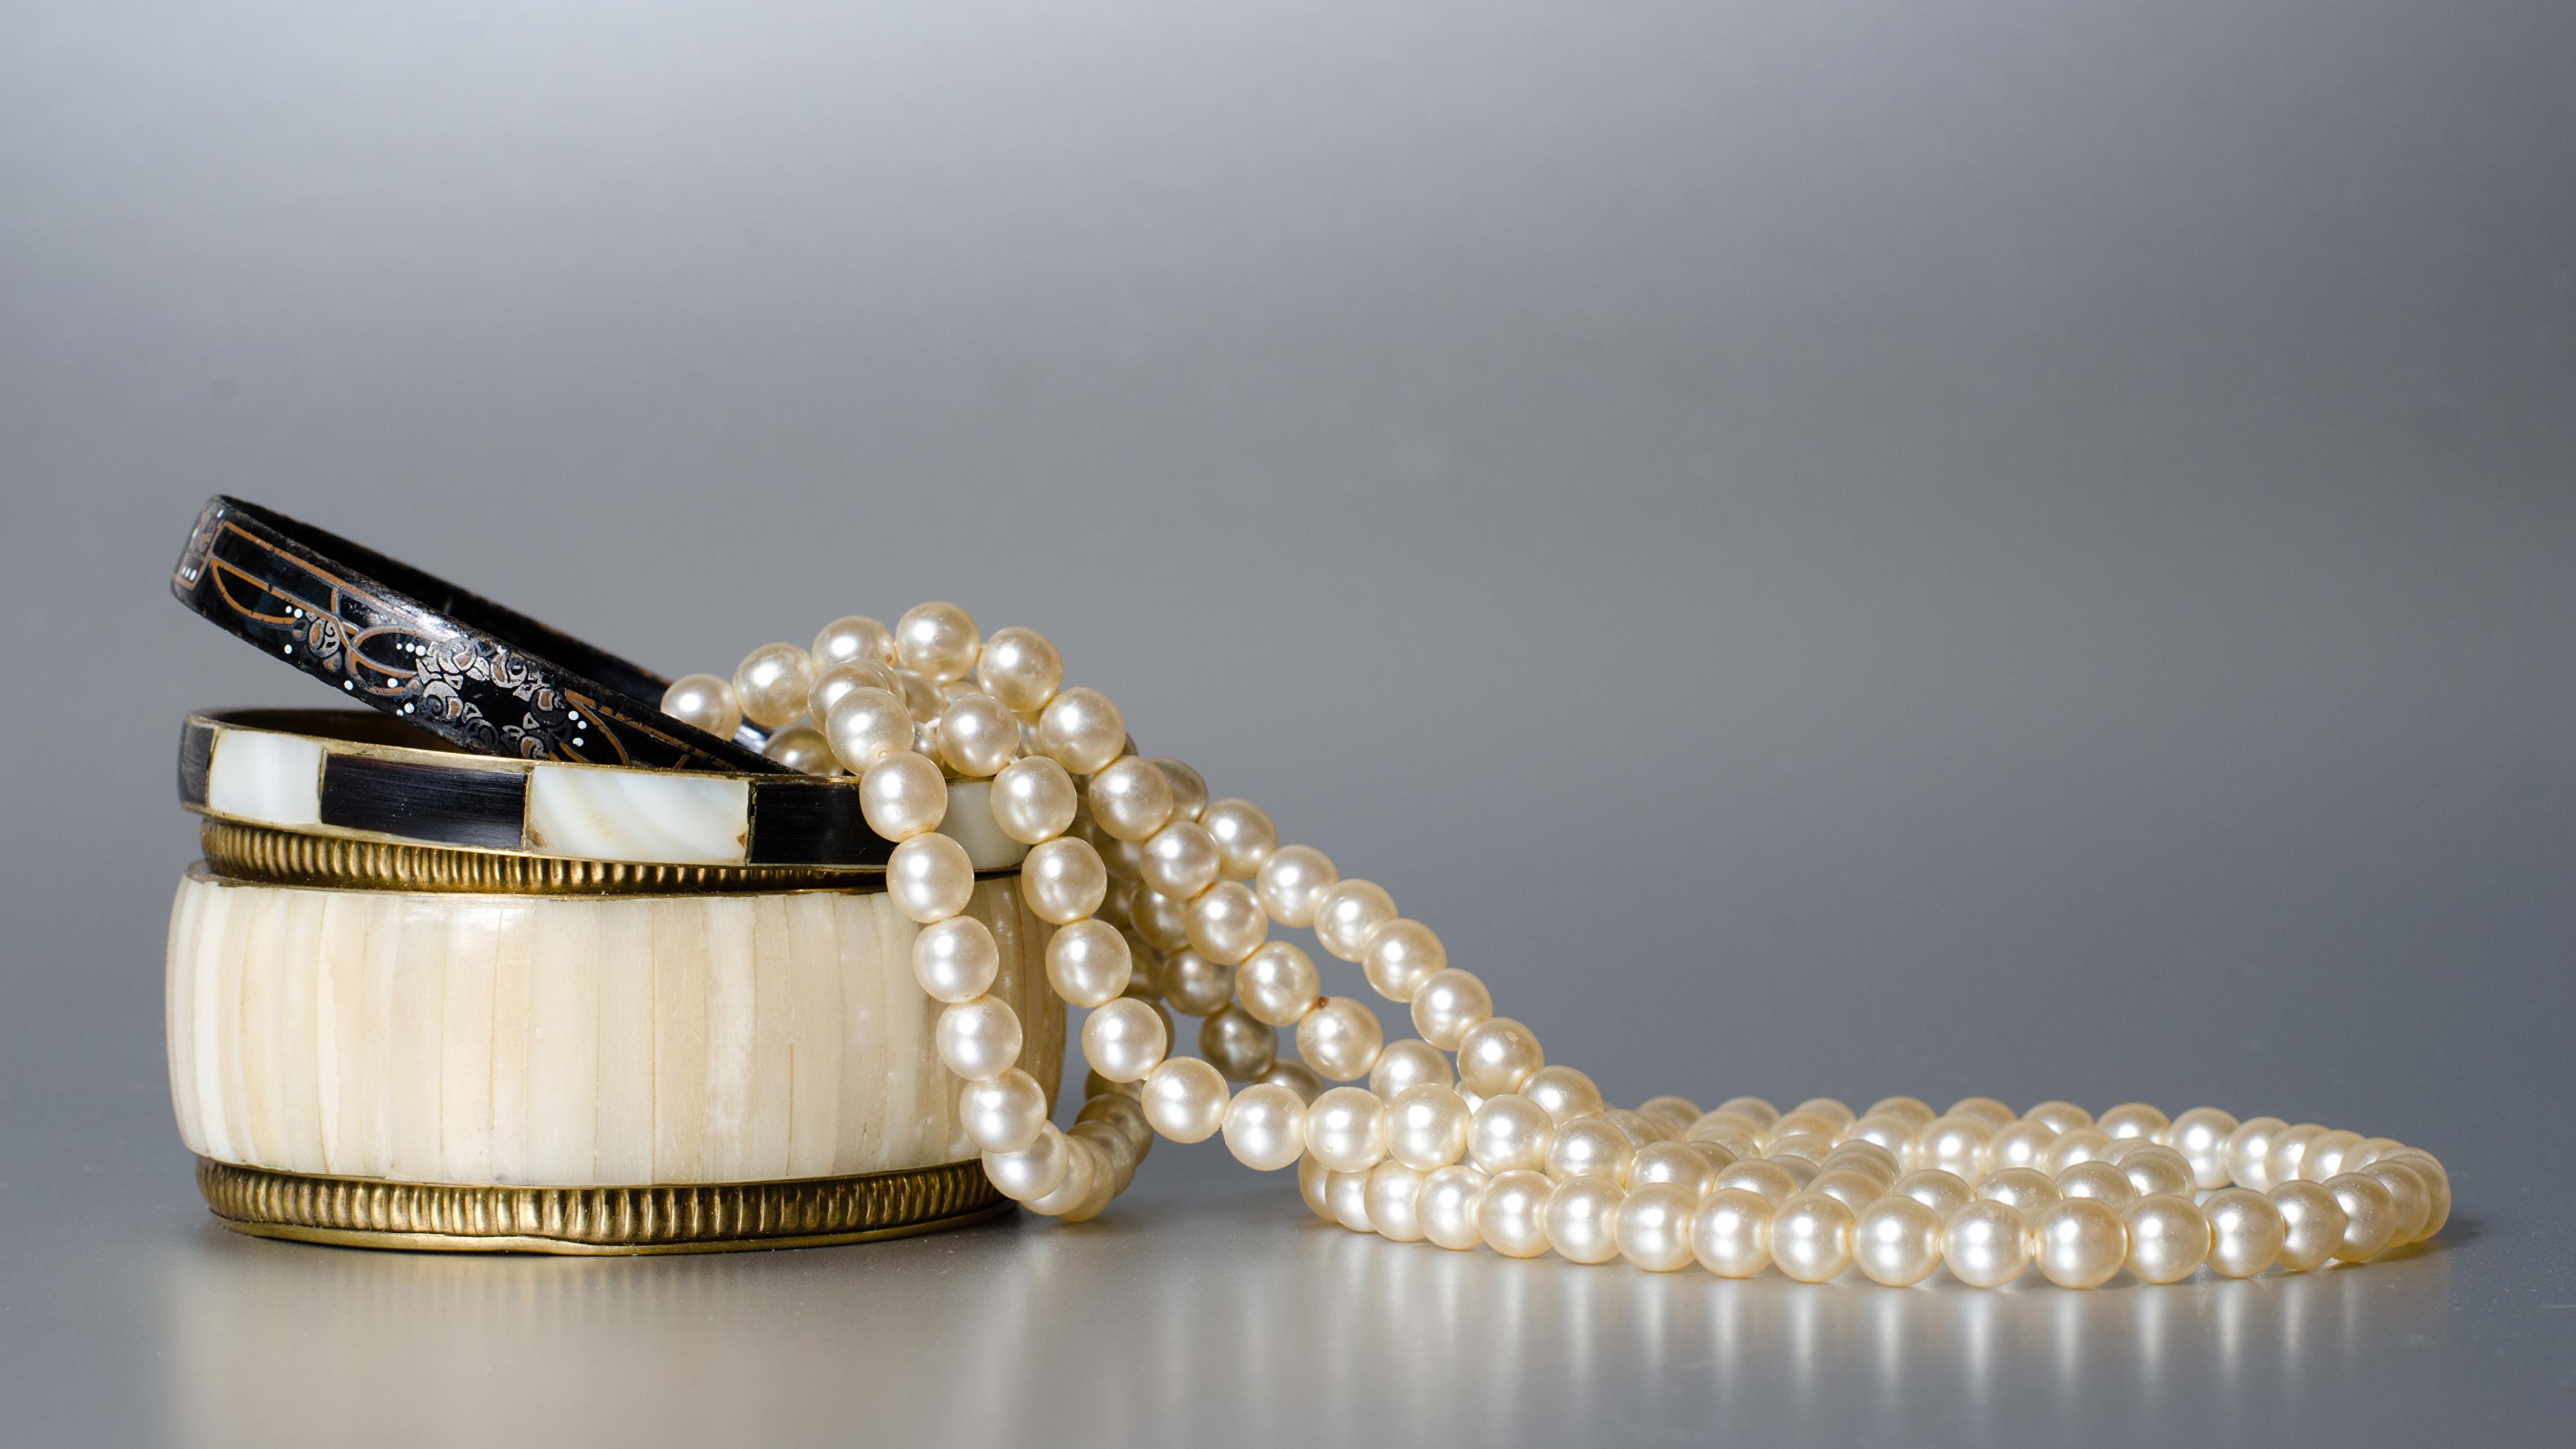 Photo Pearl Gray Background Jewelry 3840x2160